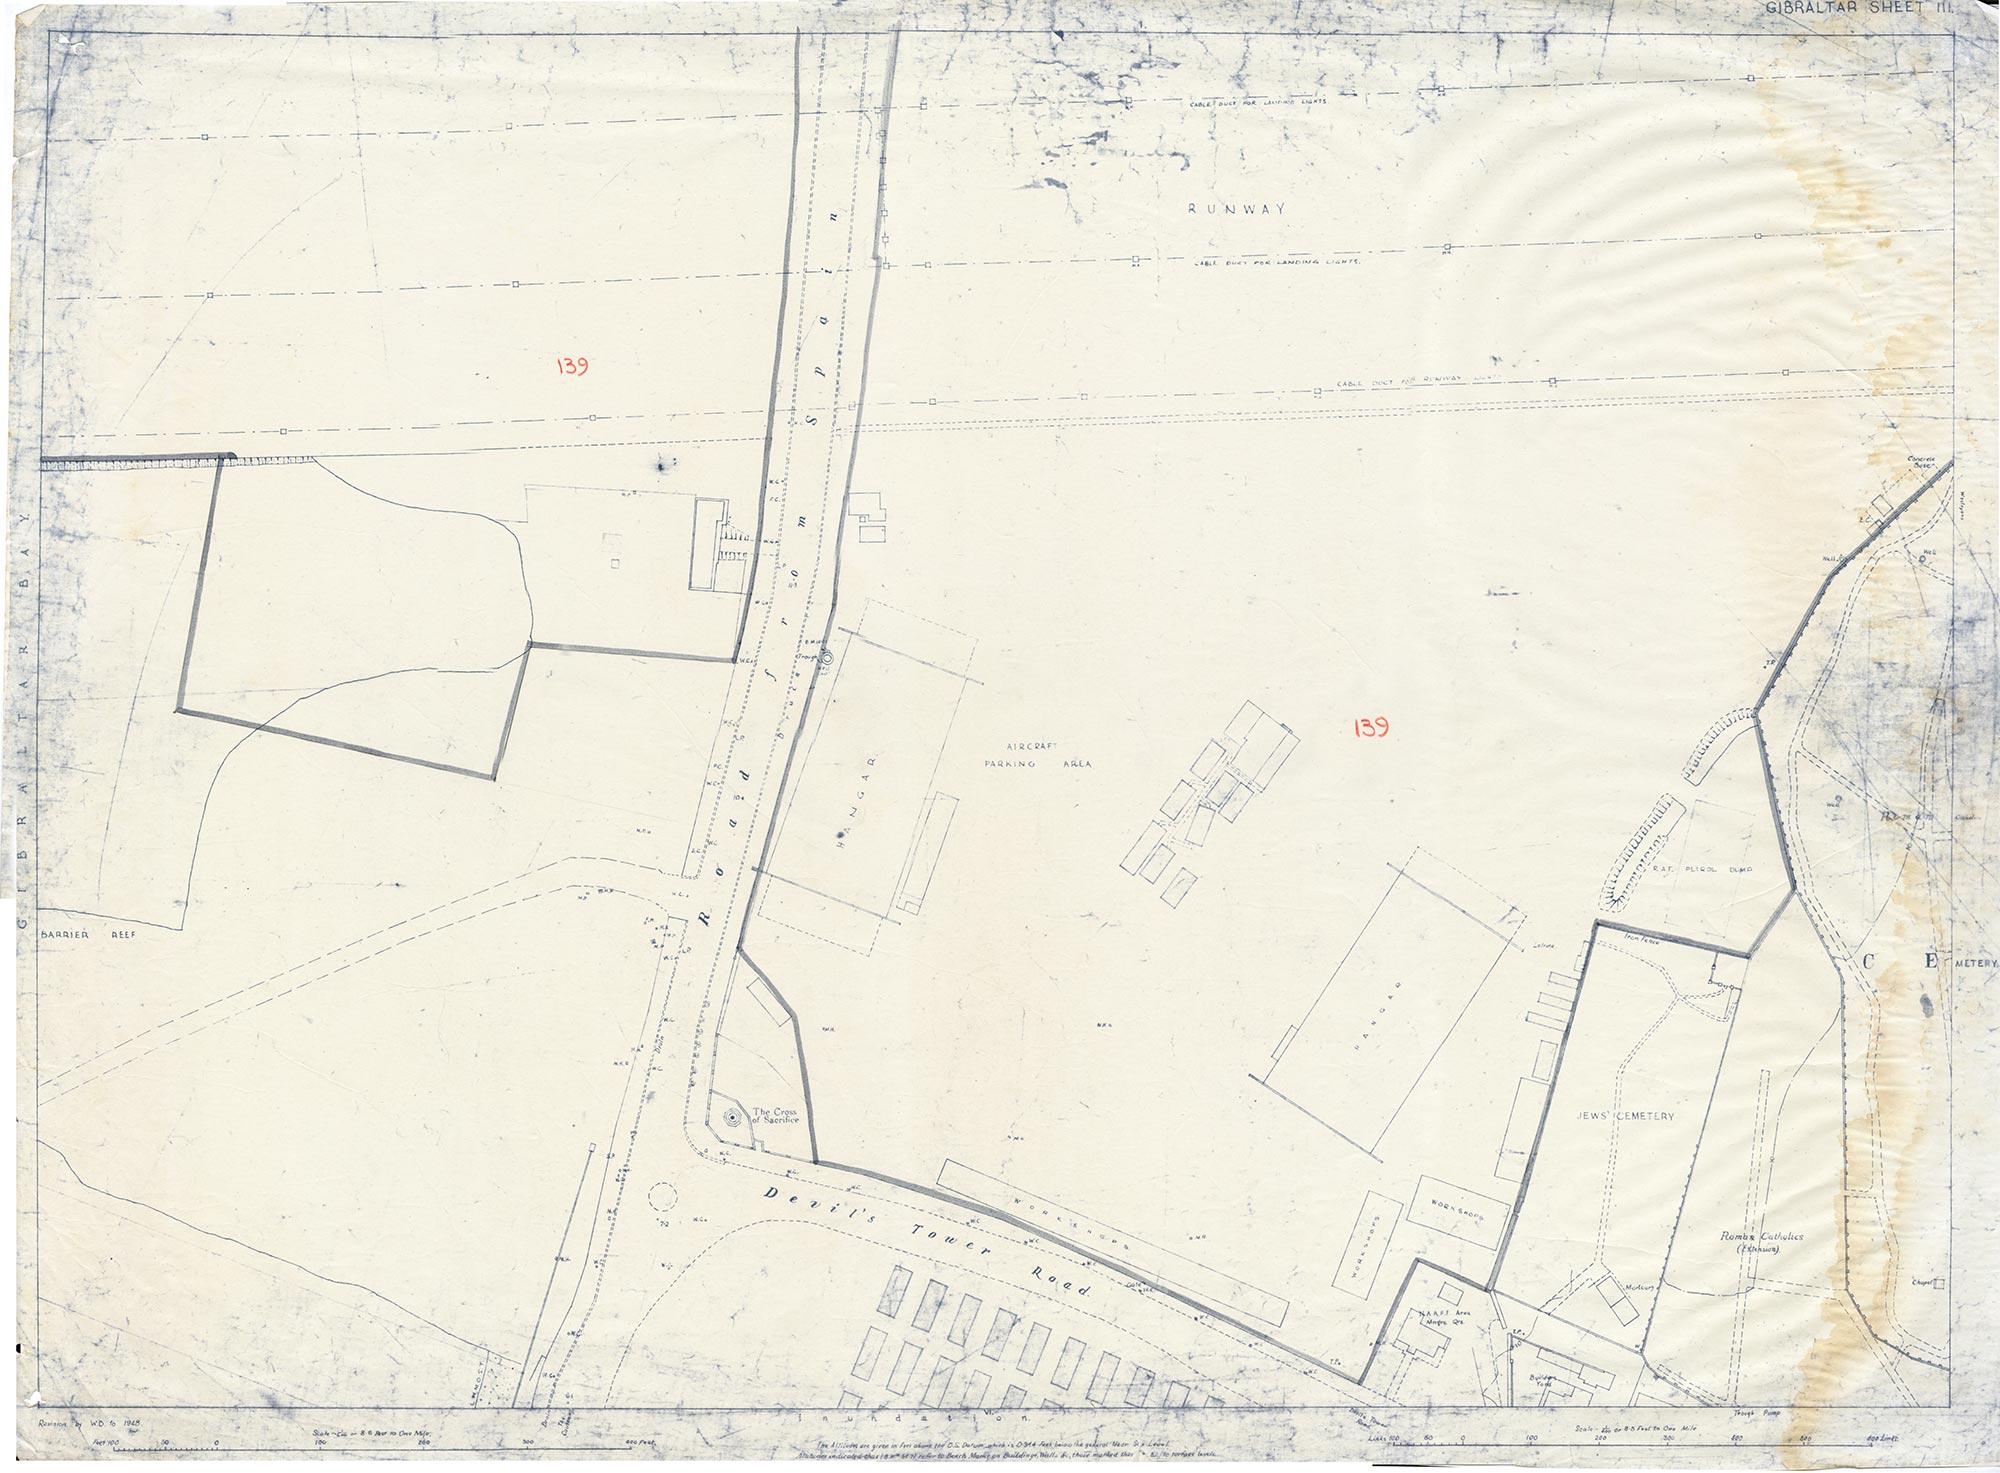 Map-4-Gibraltar-Sheet-3-1948-Sundial-Roundabout